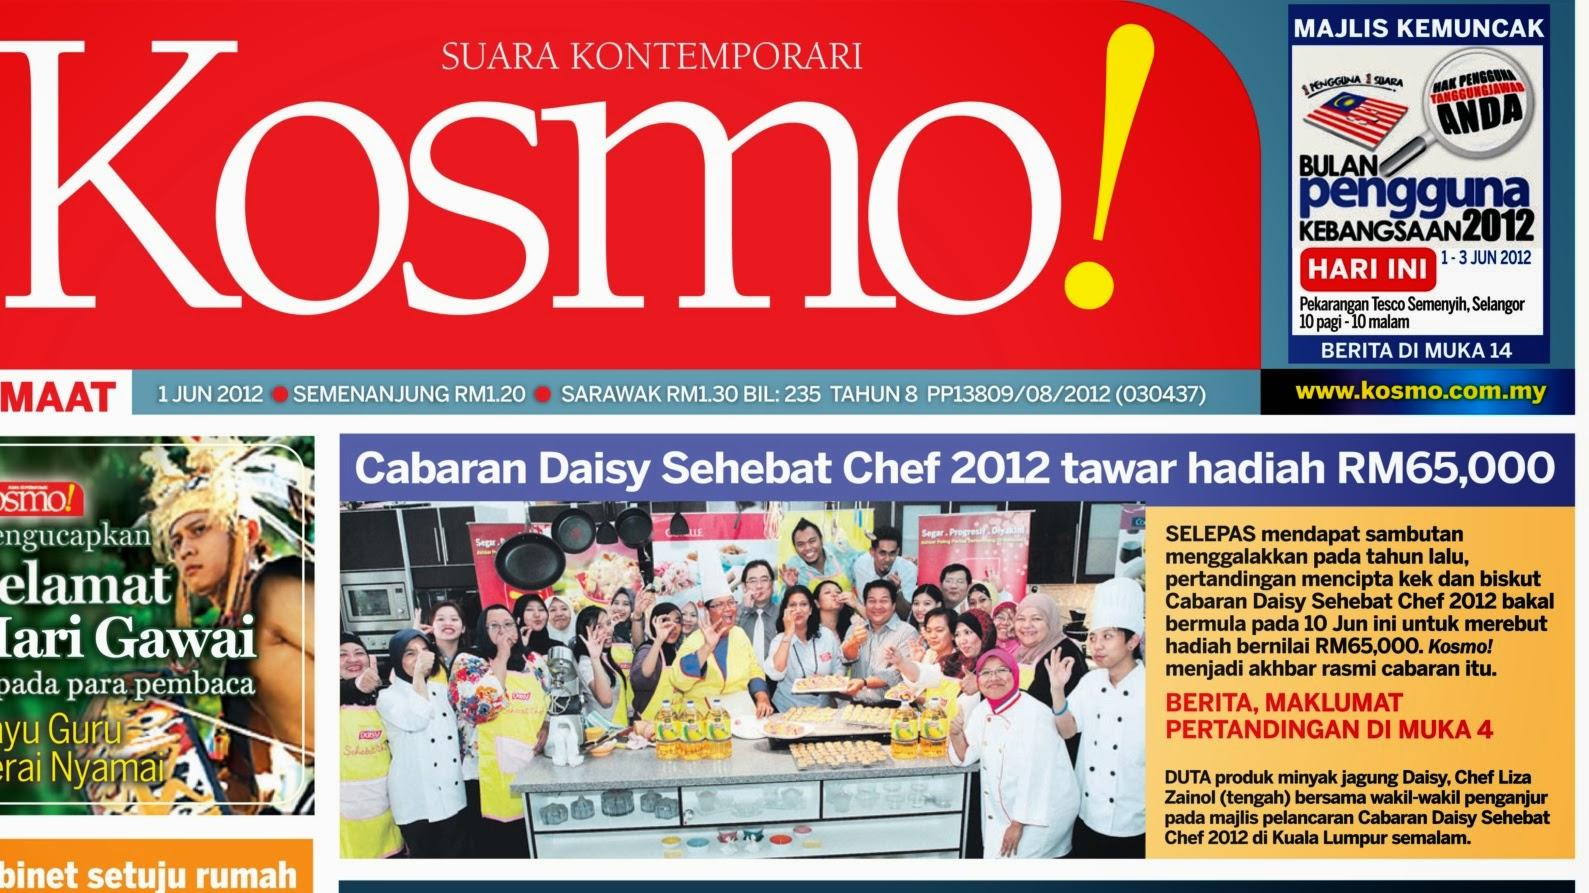 KOSMOS ~ Launching Cabaran Daisy